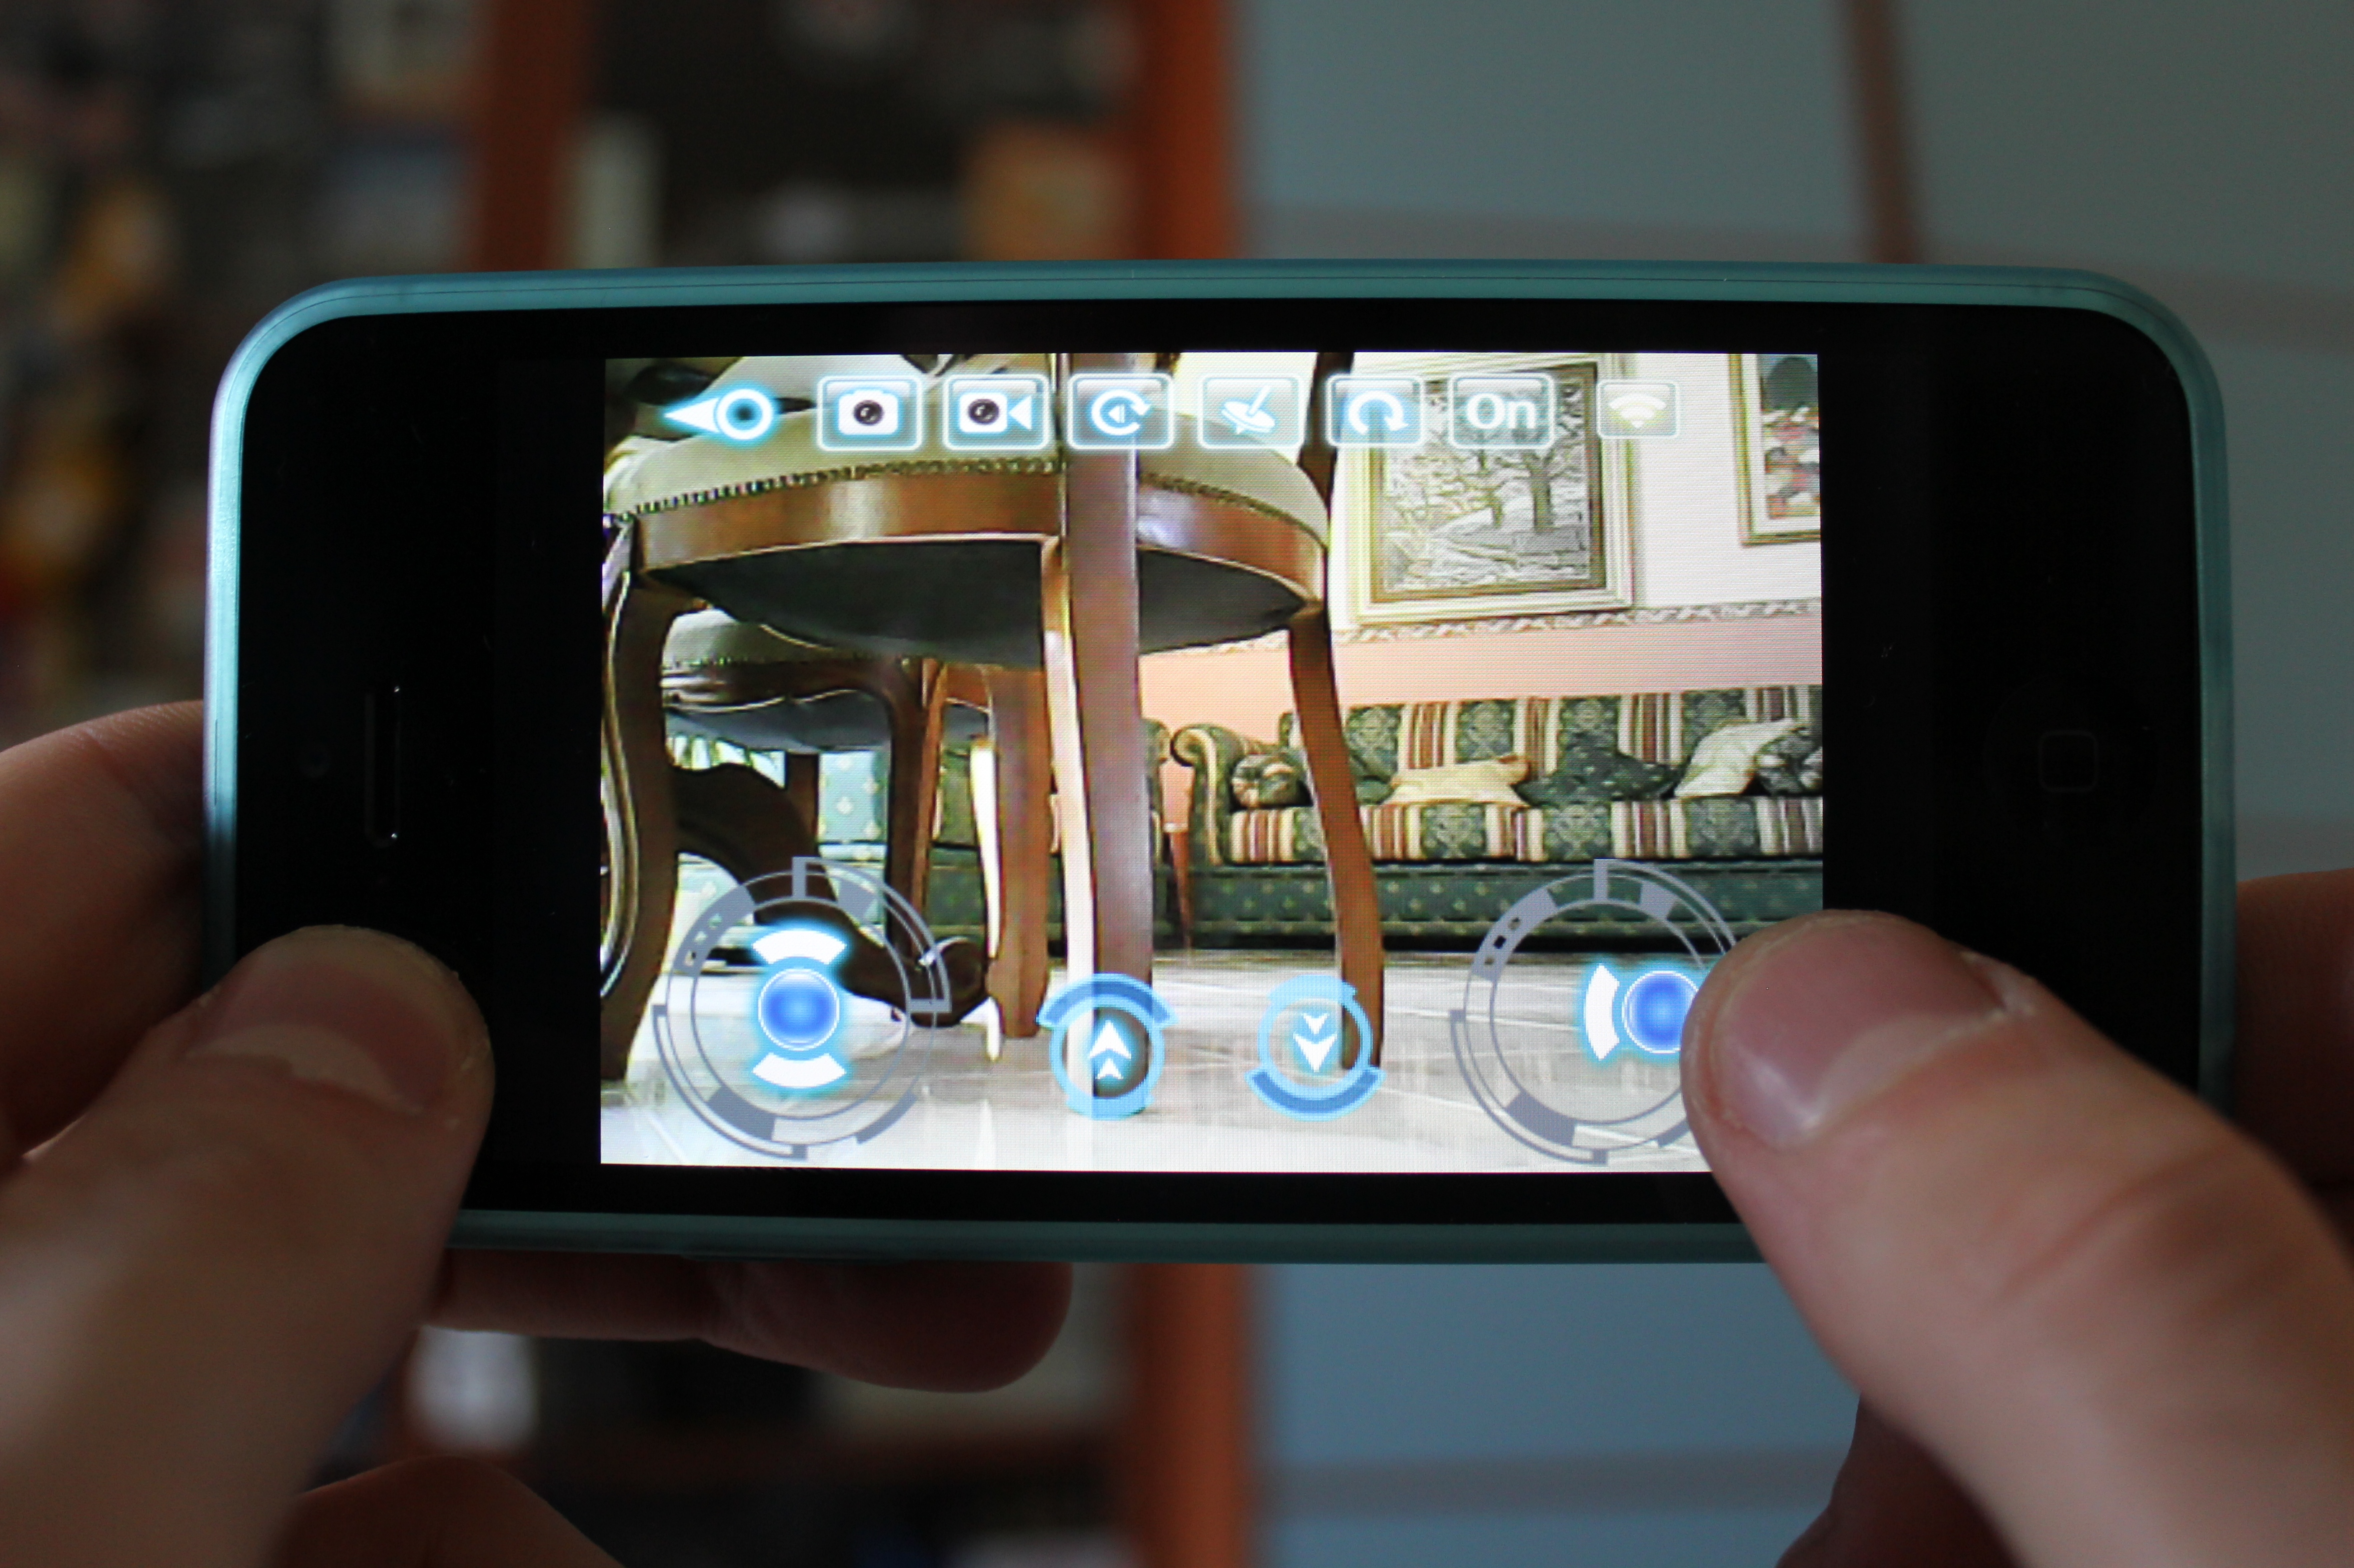 spiare iphone tramite wifi